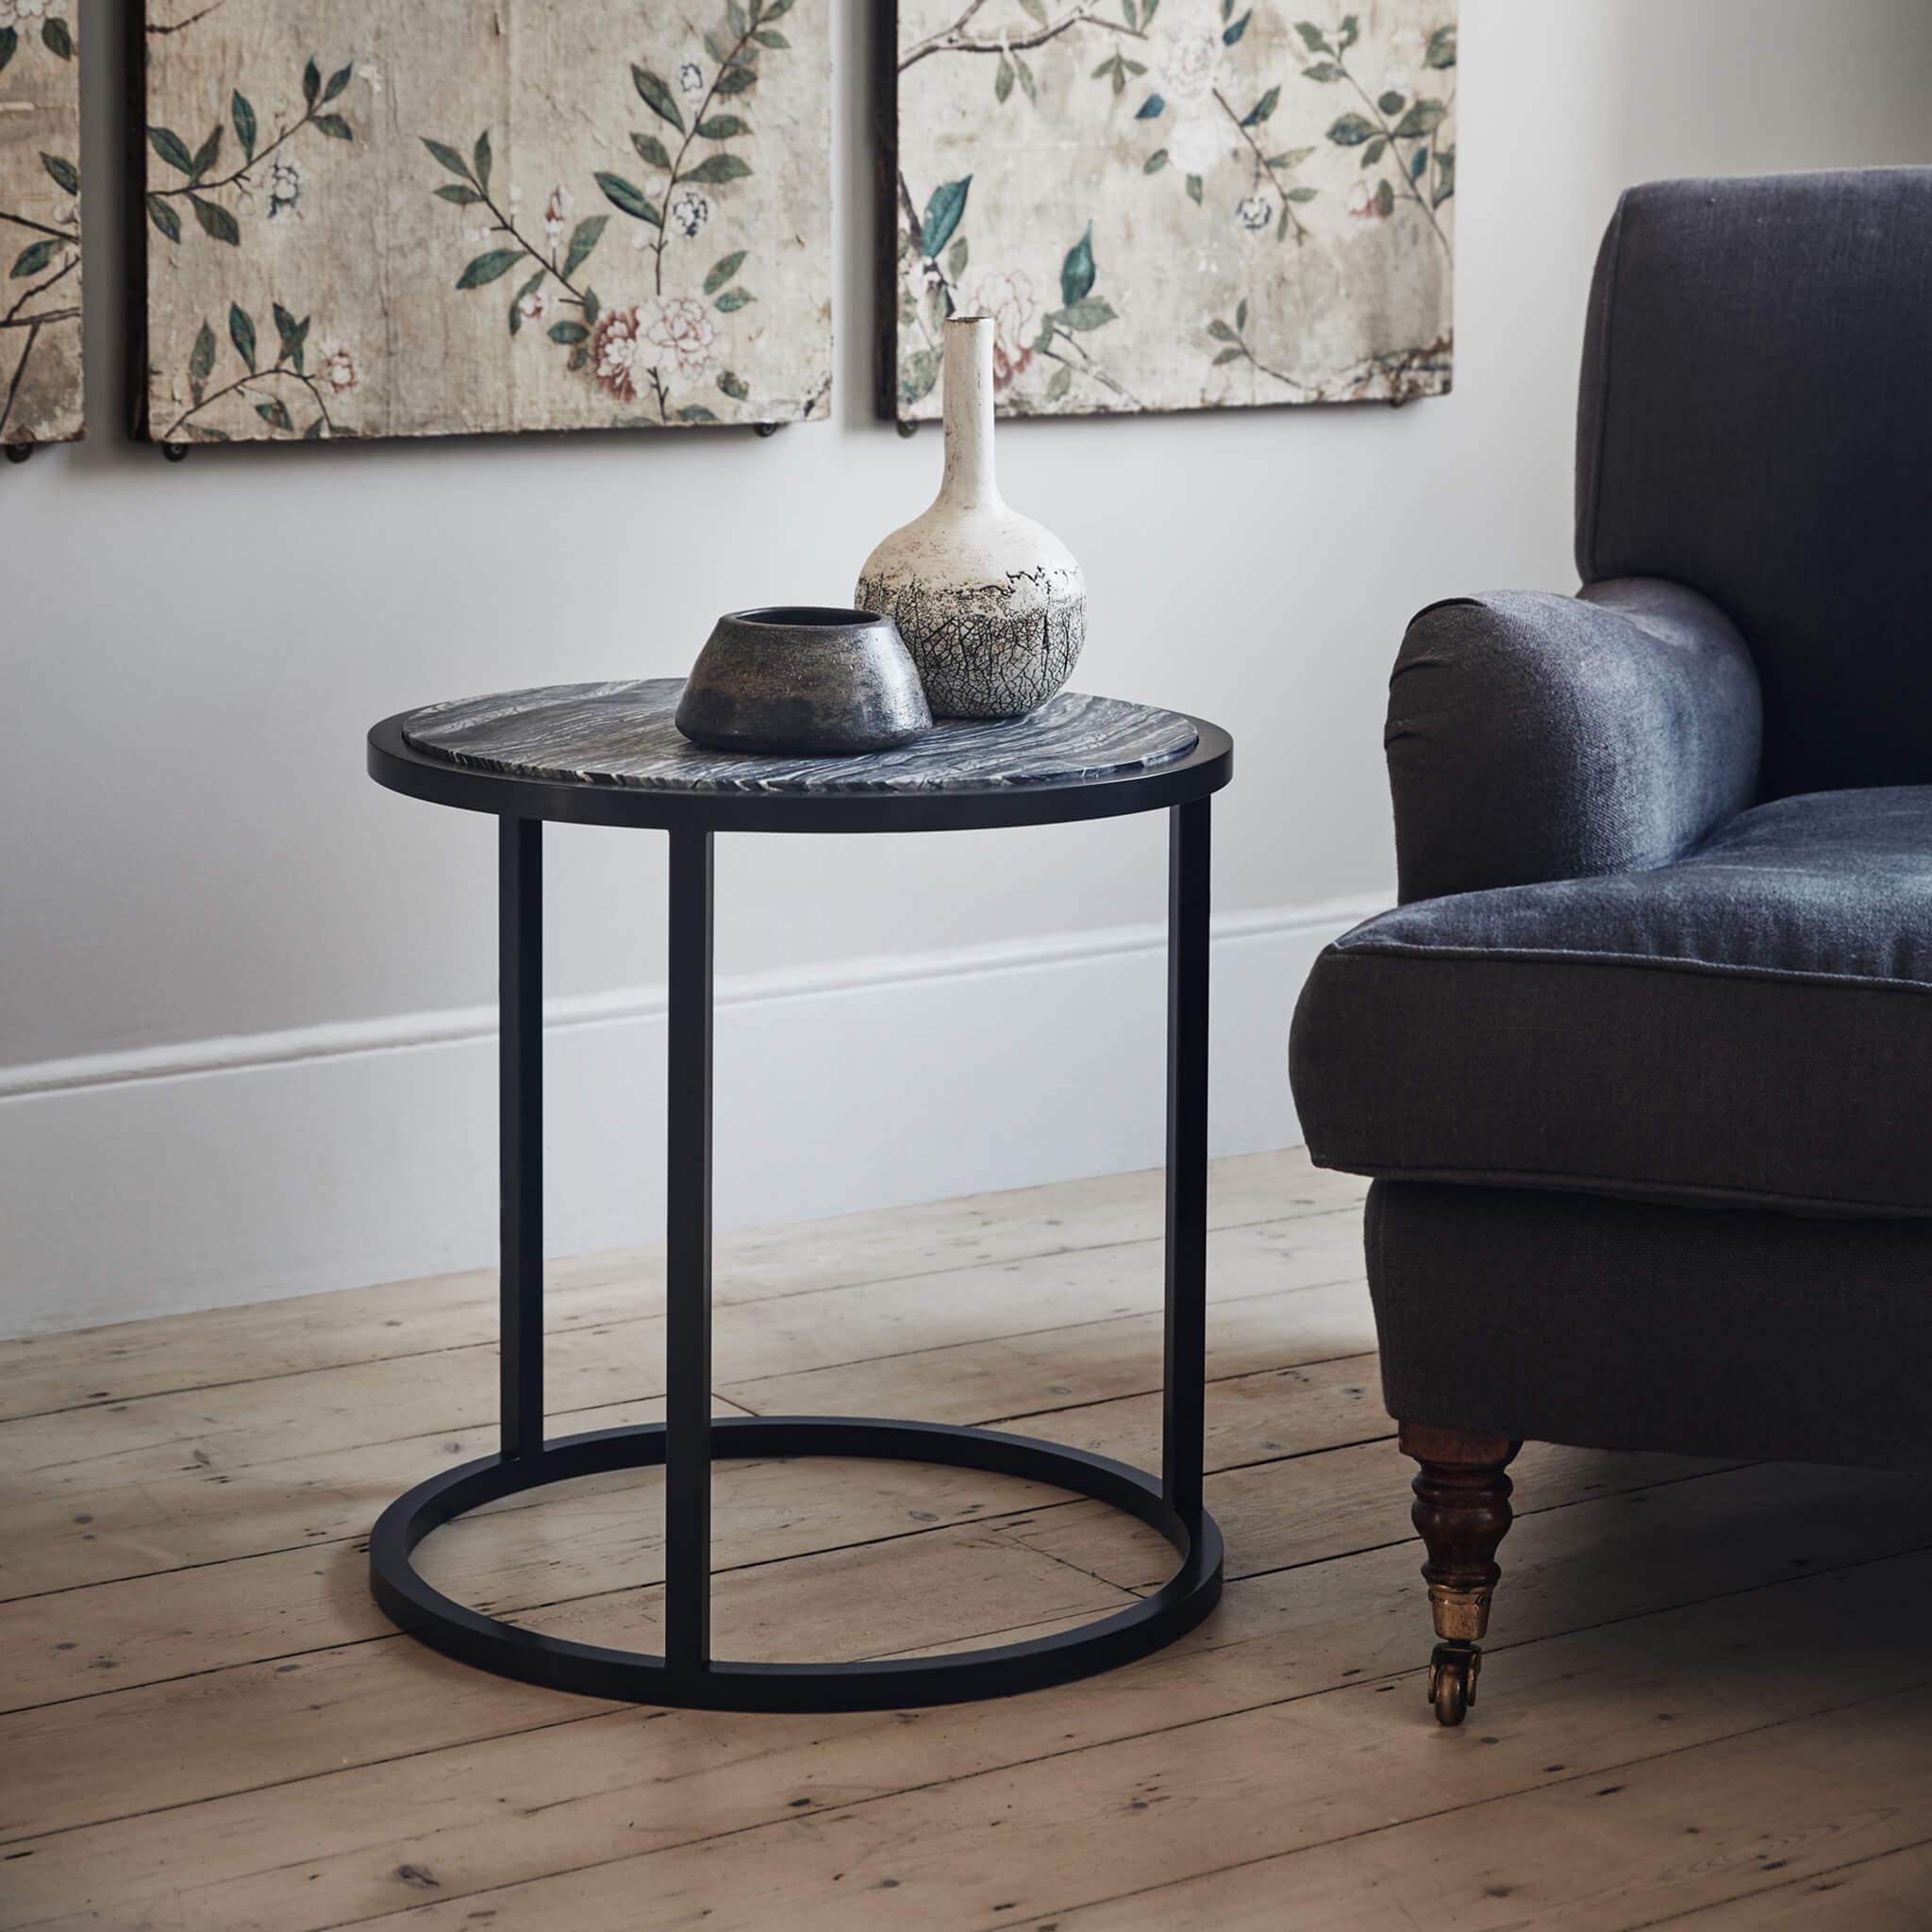 Siena Round Side Table | modern furniture by Tom Faulkner